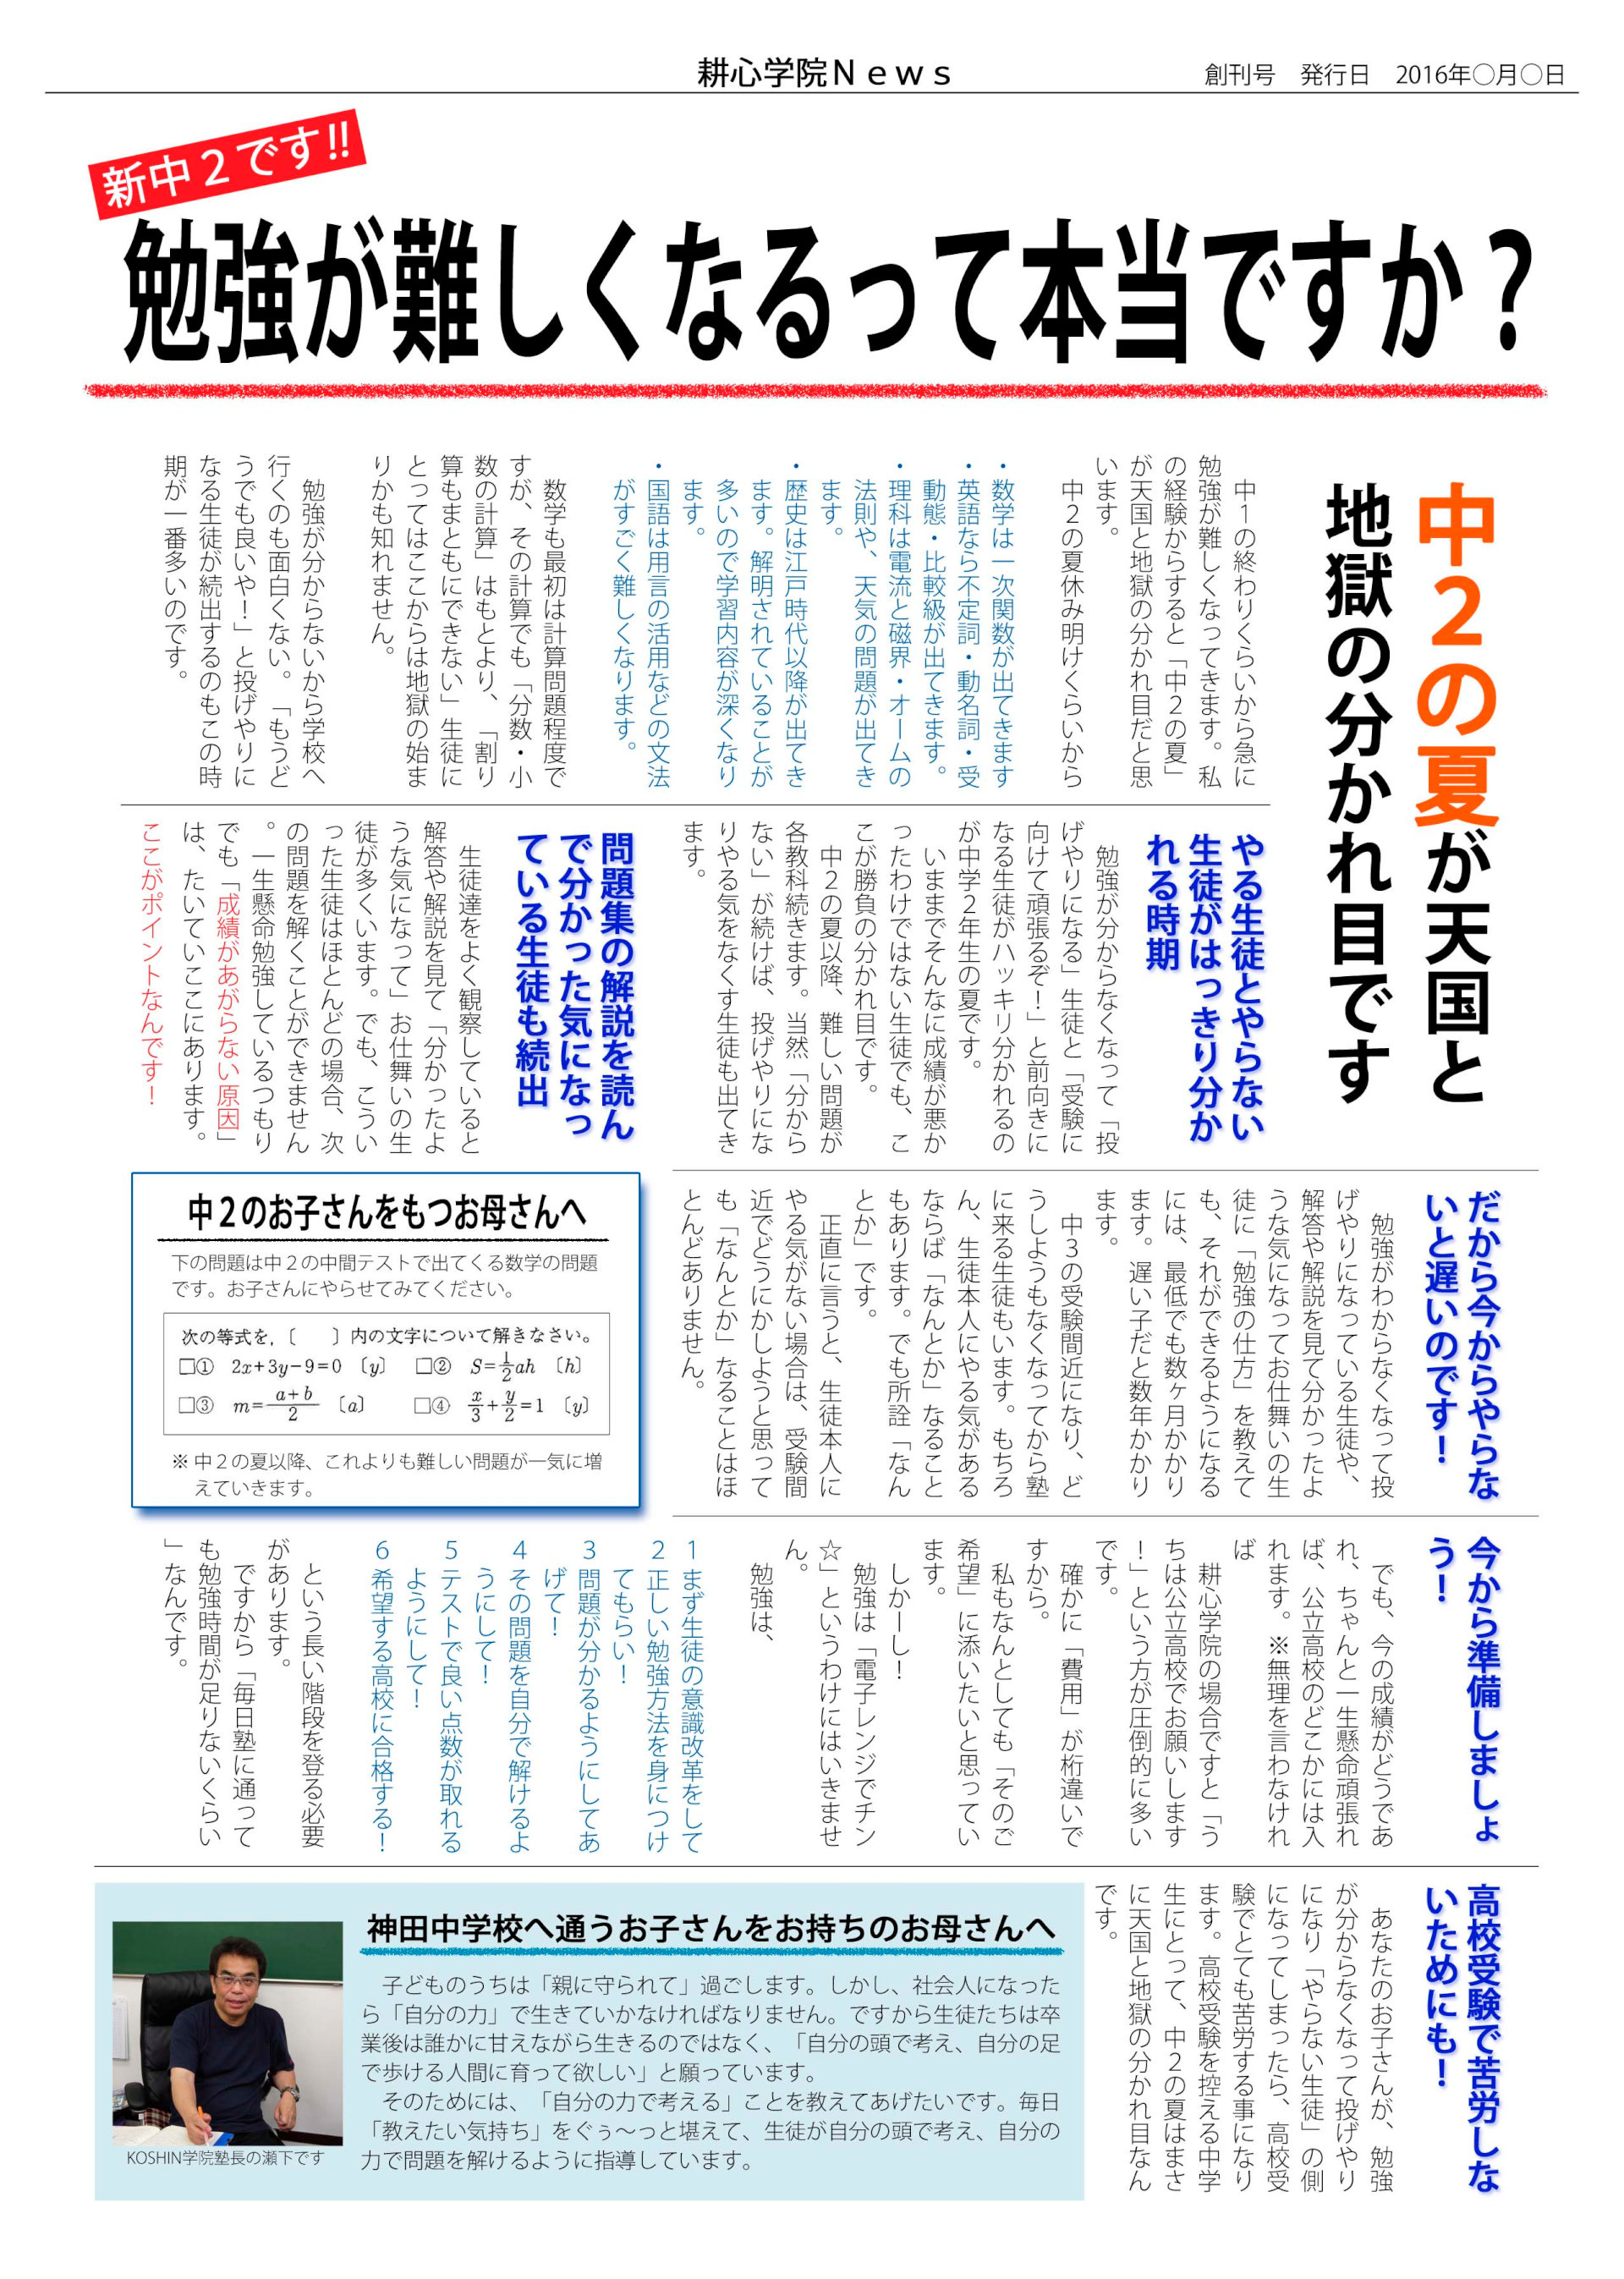 KOSHIN学院NEWS創刊号